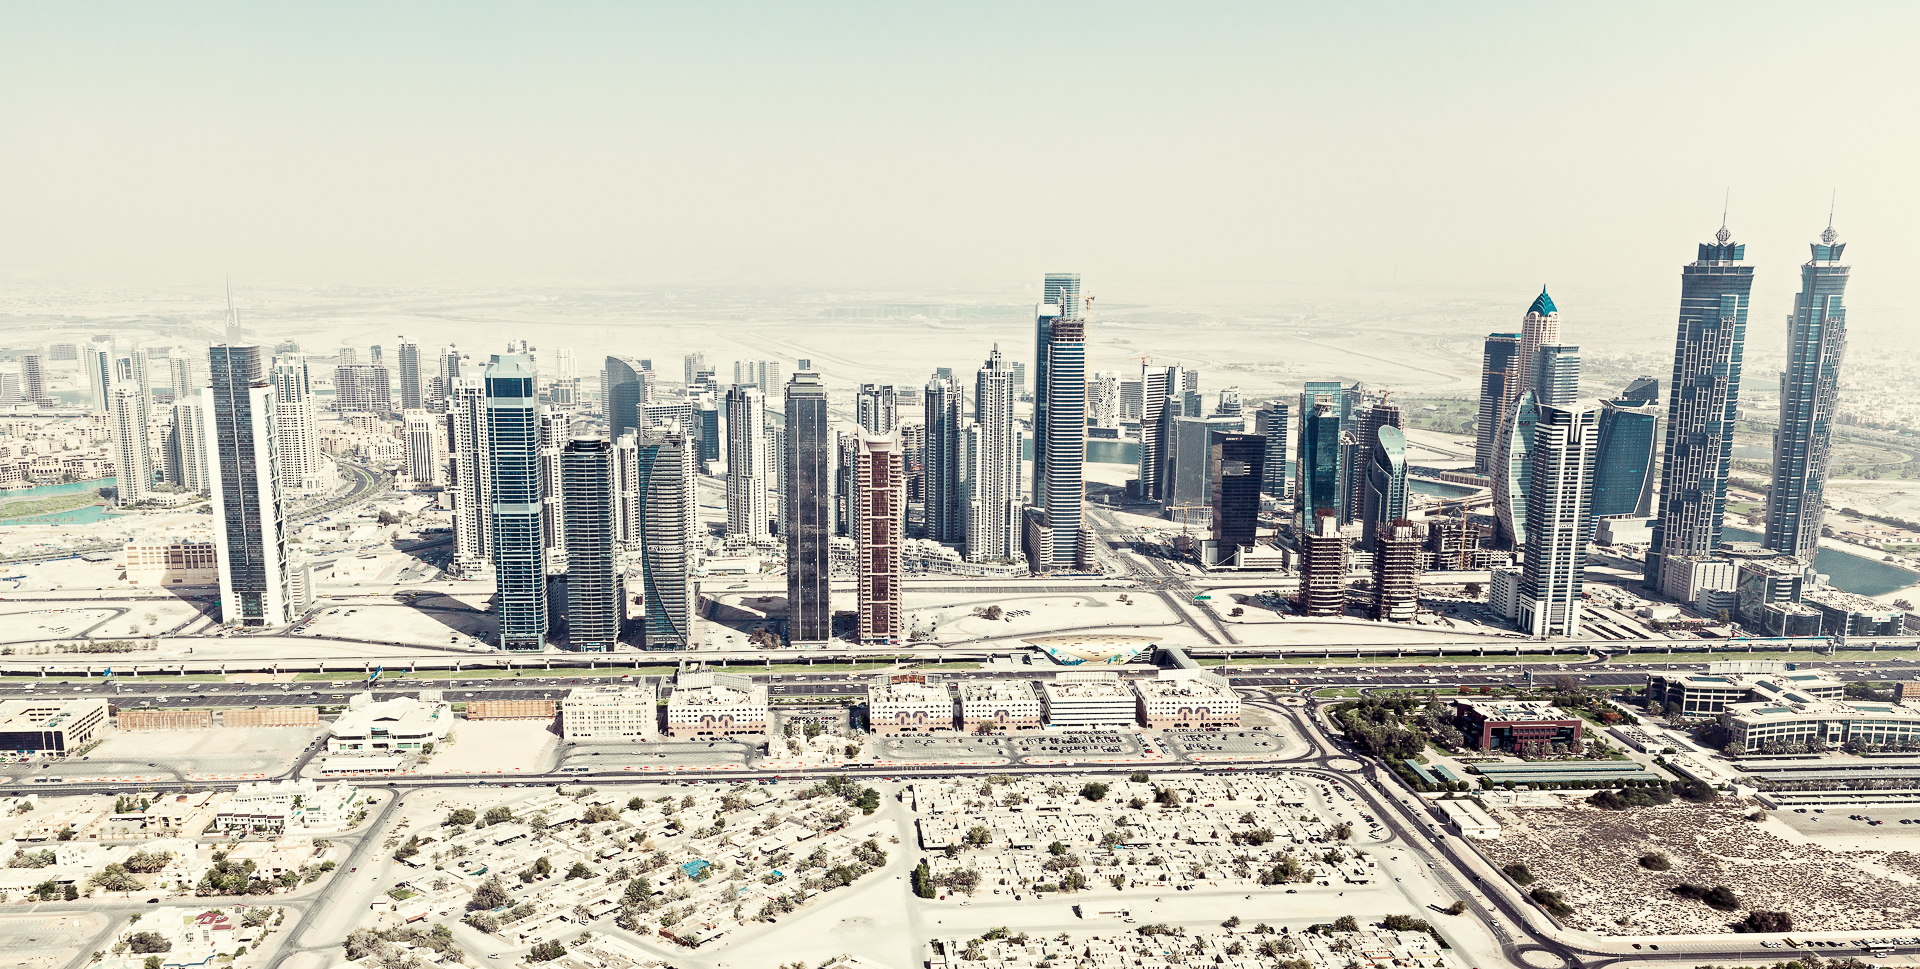 Gökhan_Orhan_Portfolio_Landscape_Dubai-8